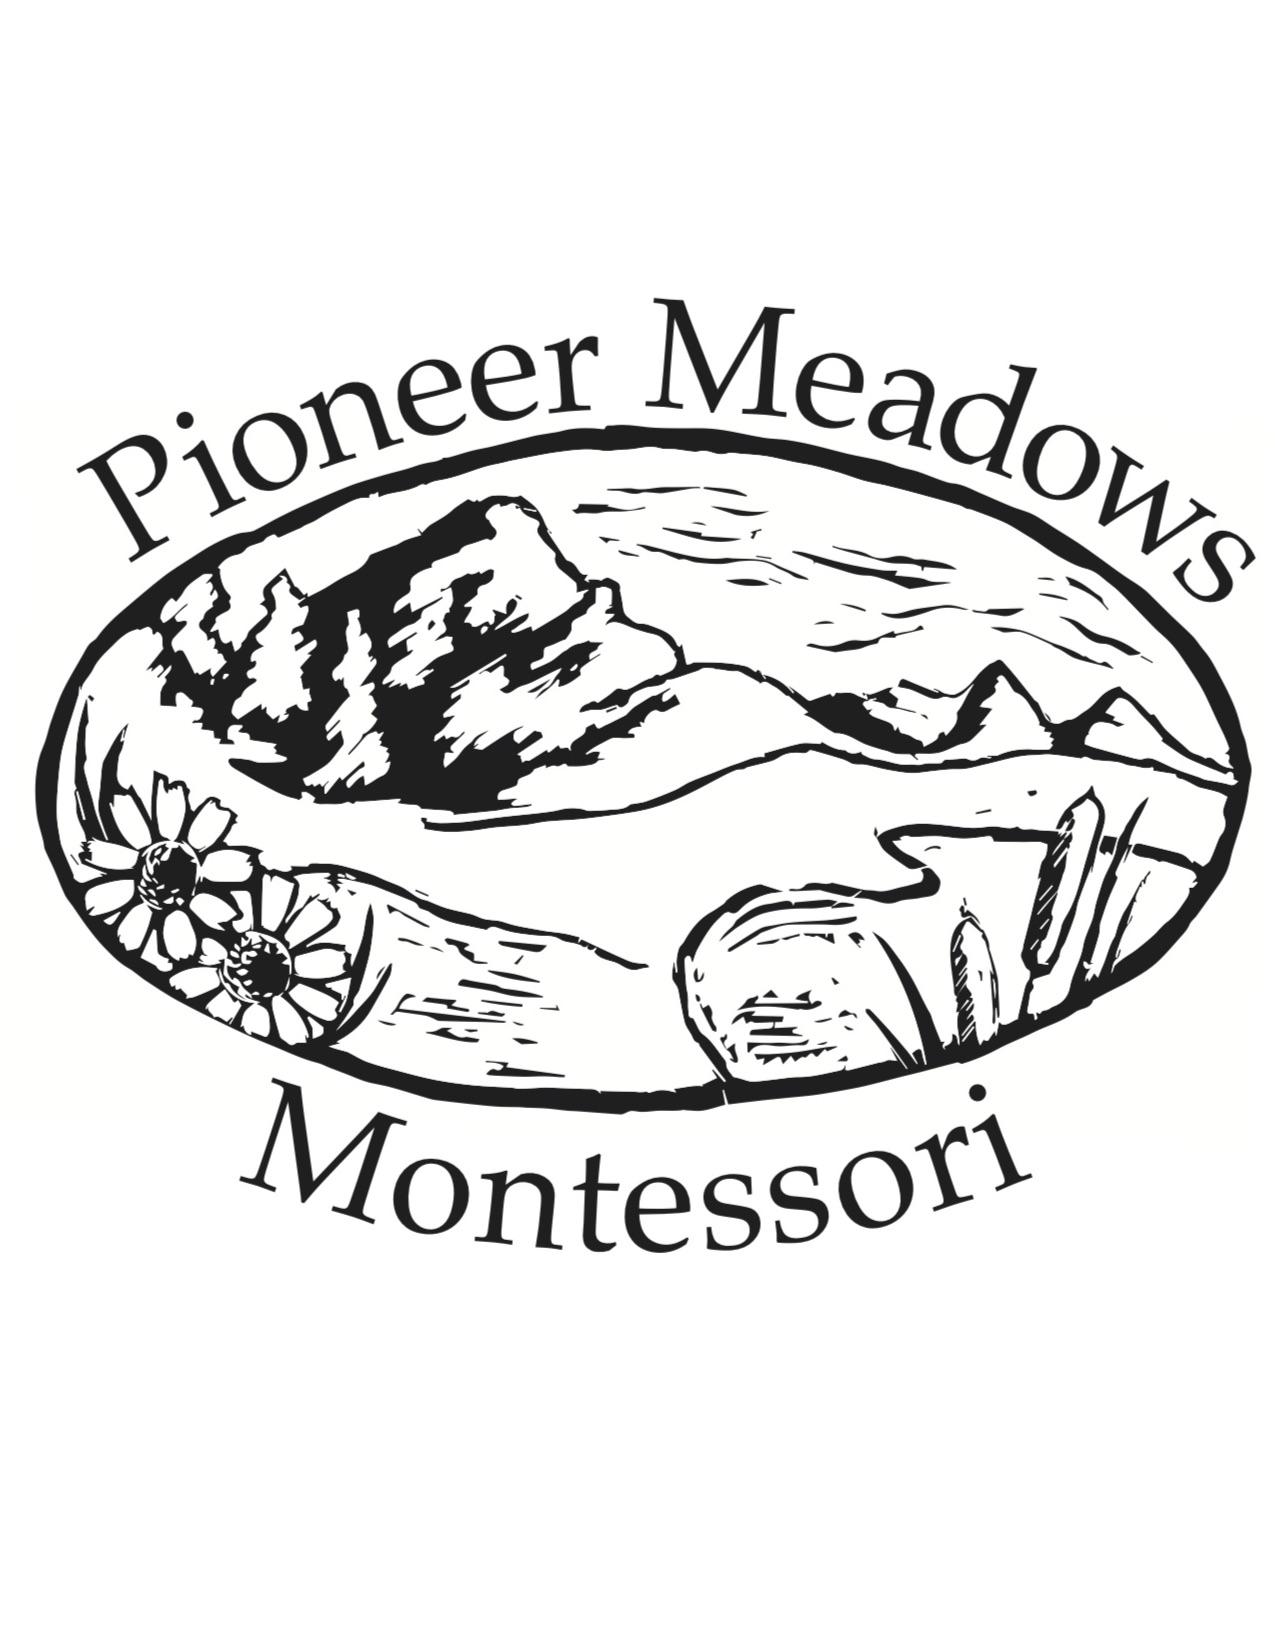 Preschool Information Night: Pioneer Meadows Montessori